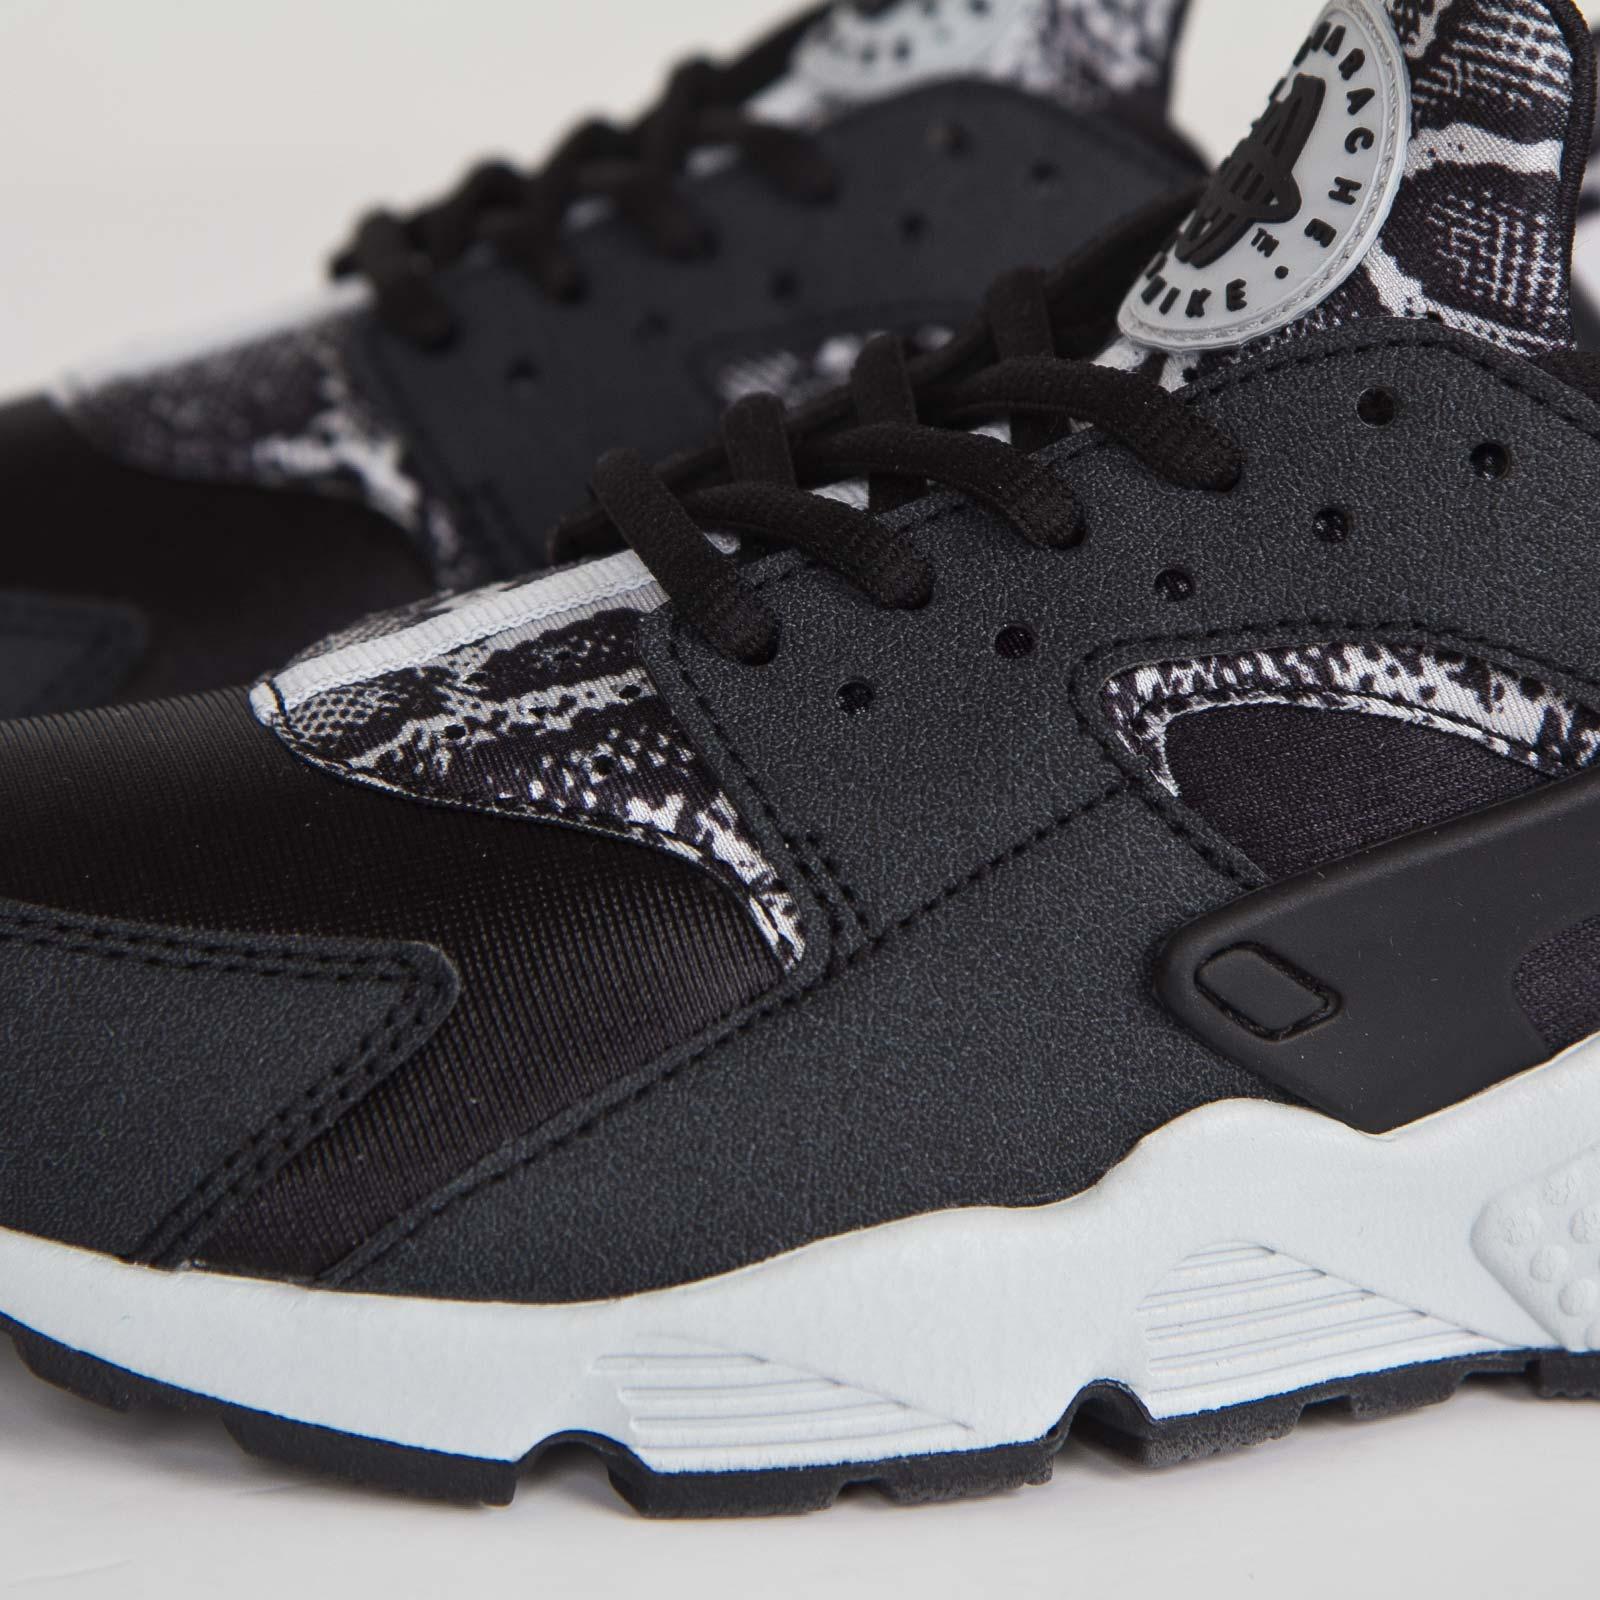 promo code de600 e0992 Nike Wmns Air Huarache Run Print - 725076-002 - Sneakersnstuff   sneakers    streetwear online since 1999